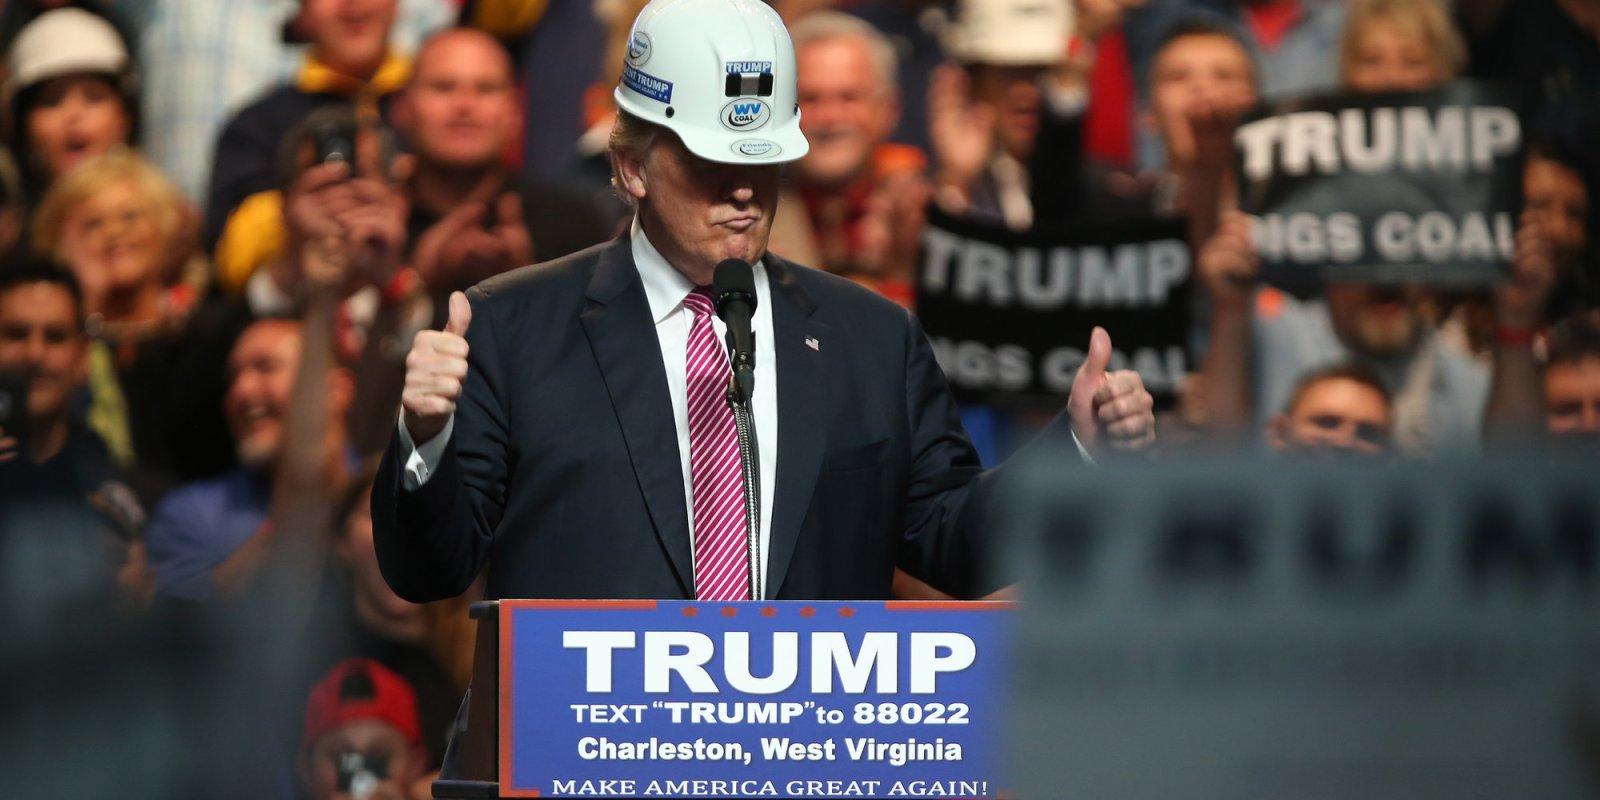 An-Inconvenient-Sequel-Trailer-Trump-Coal-Cover-Image